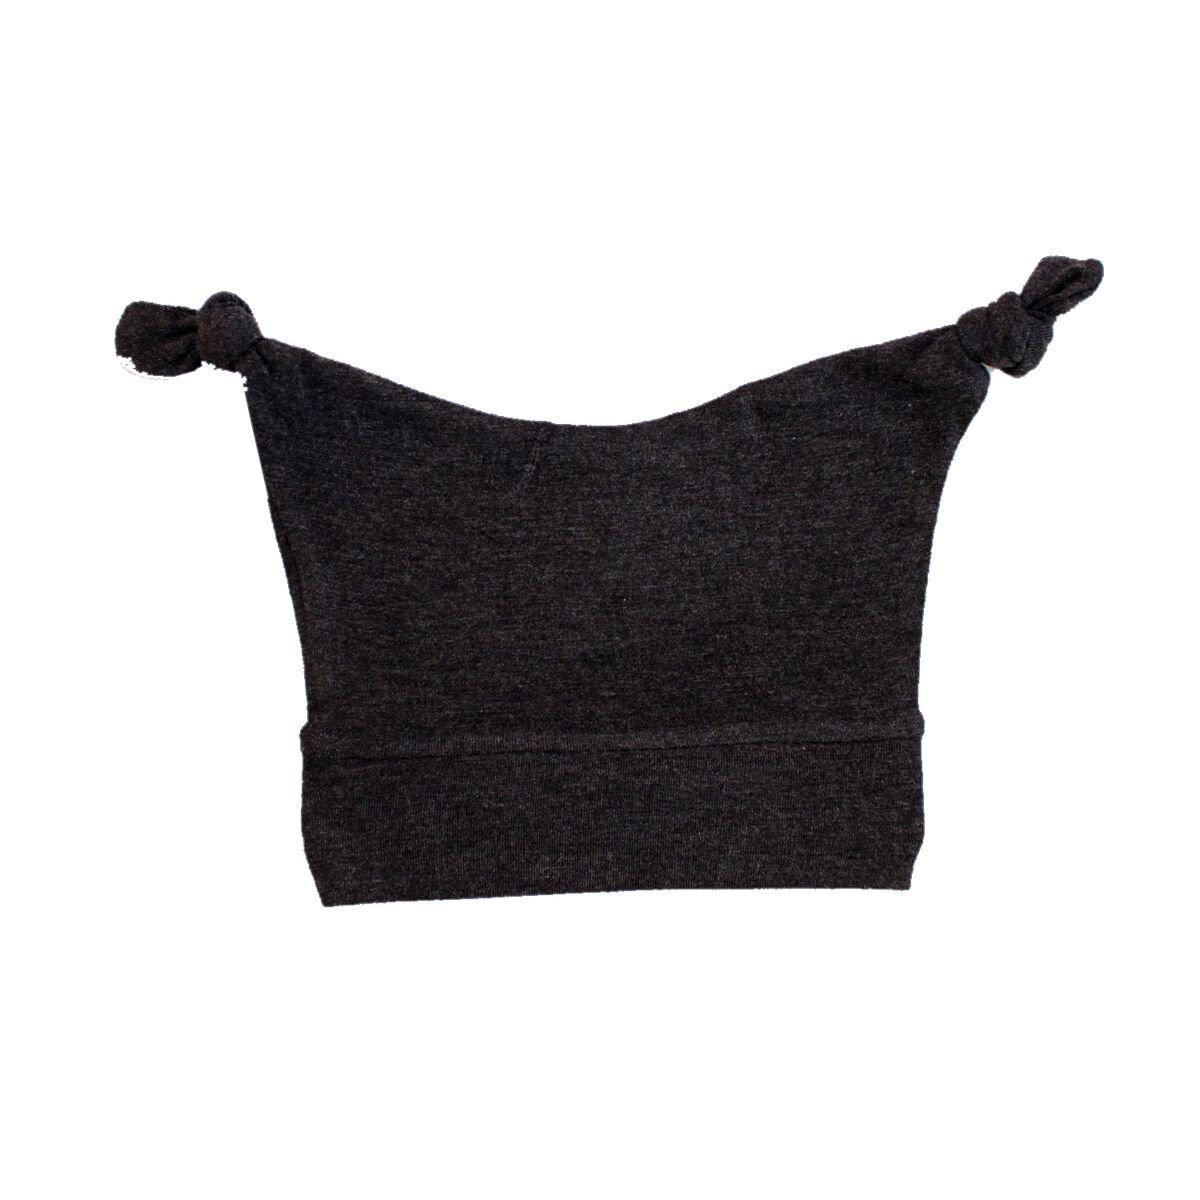 Black Rockstar 20-25 lbs Mod Swad Fashionable Bamboo Baby Knot Hat